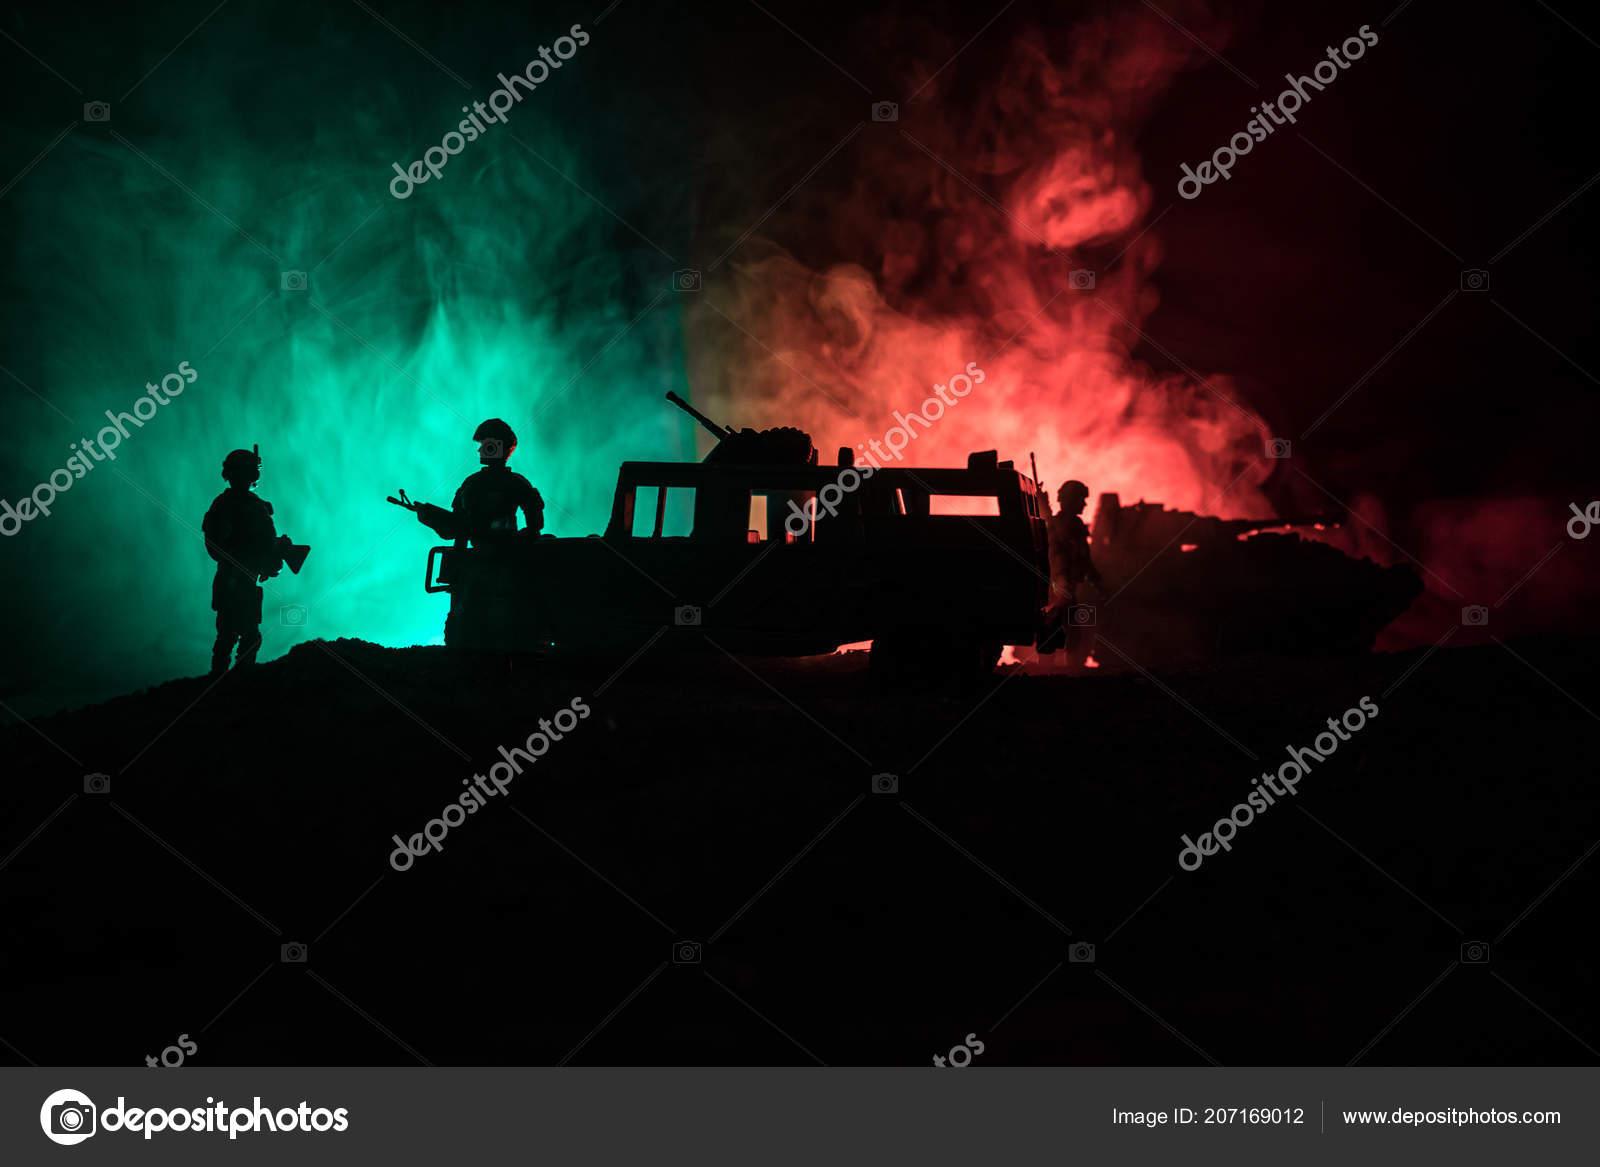 War Concept Military Silhouettes Fighting Scene War Fog Sky